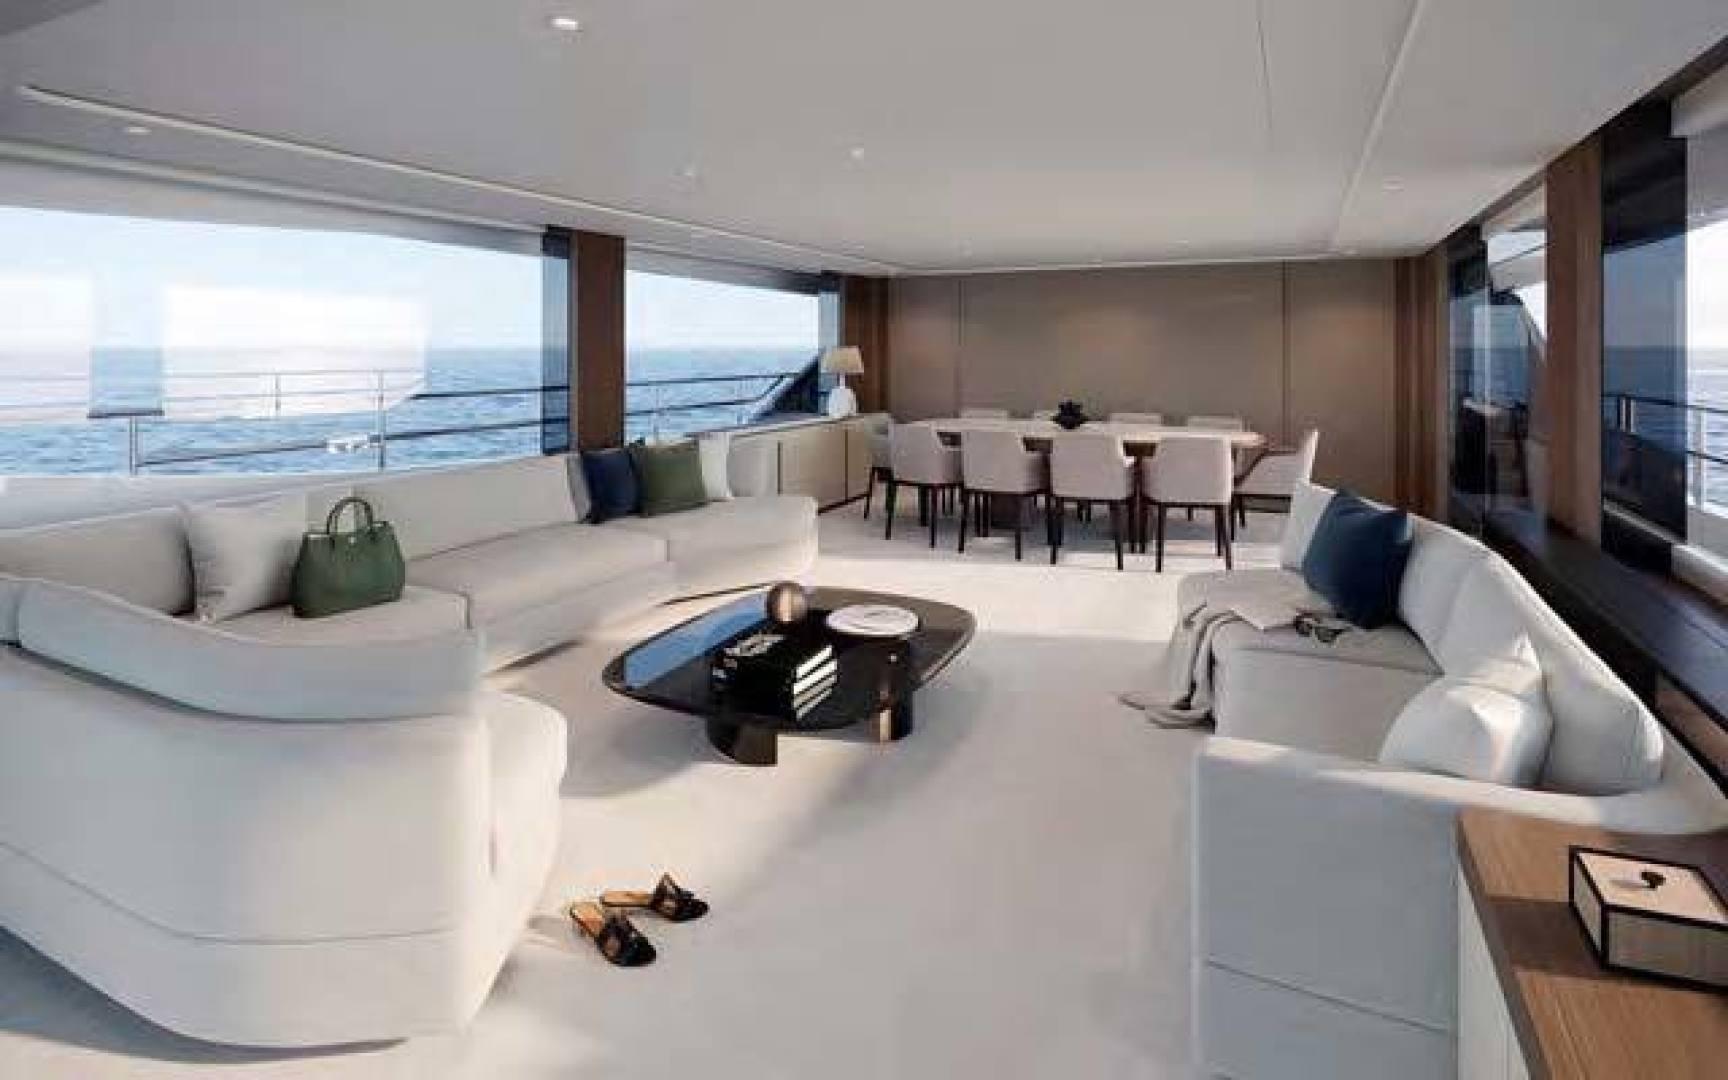 Princess-95 Motor Yacht 2022-Y95 Unknown-Florida-United States-1582770 | Thumbnail